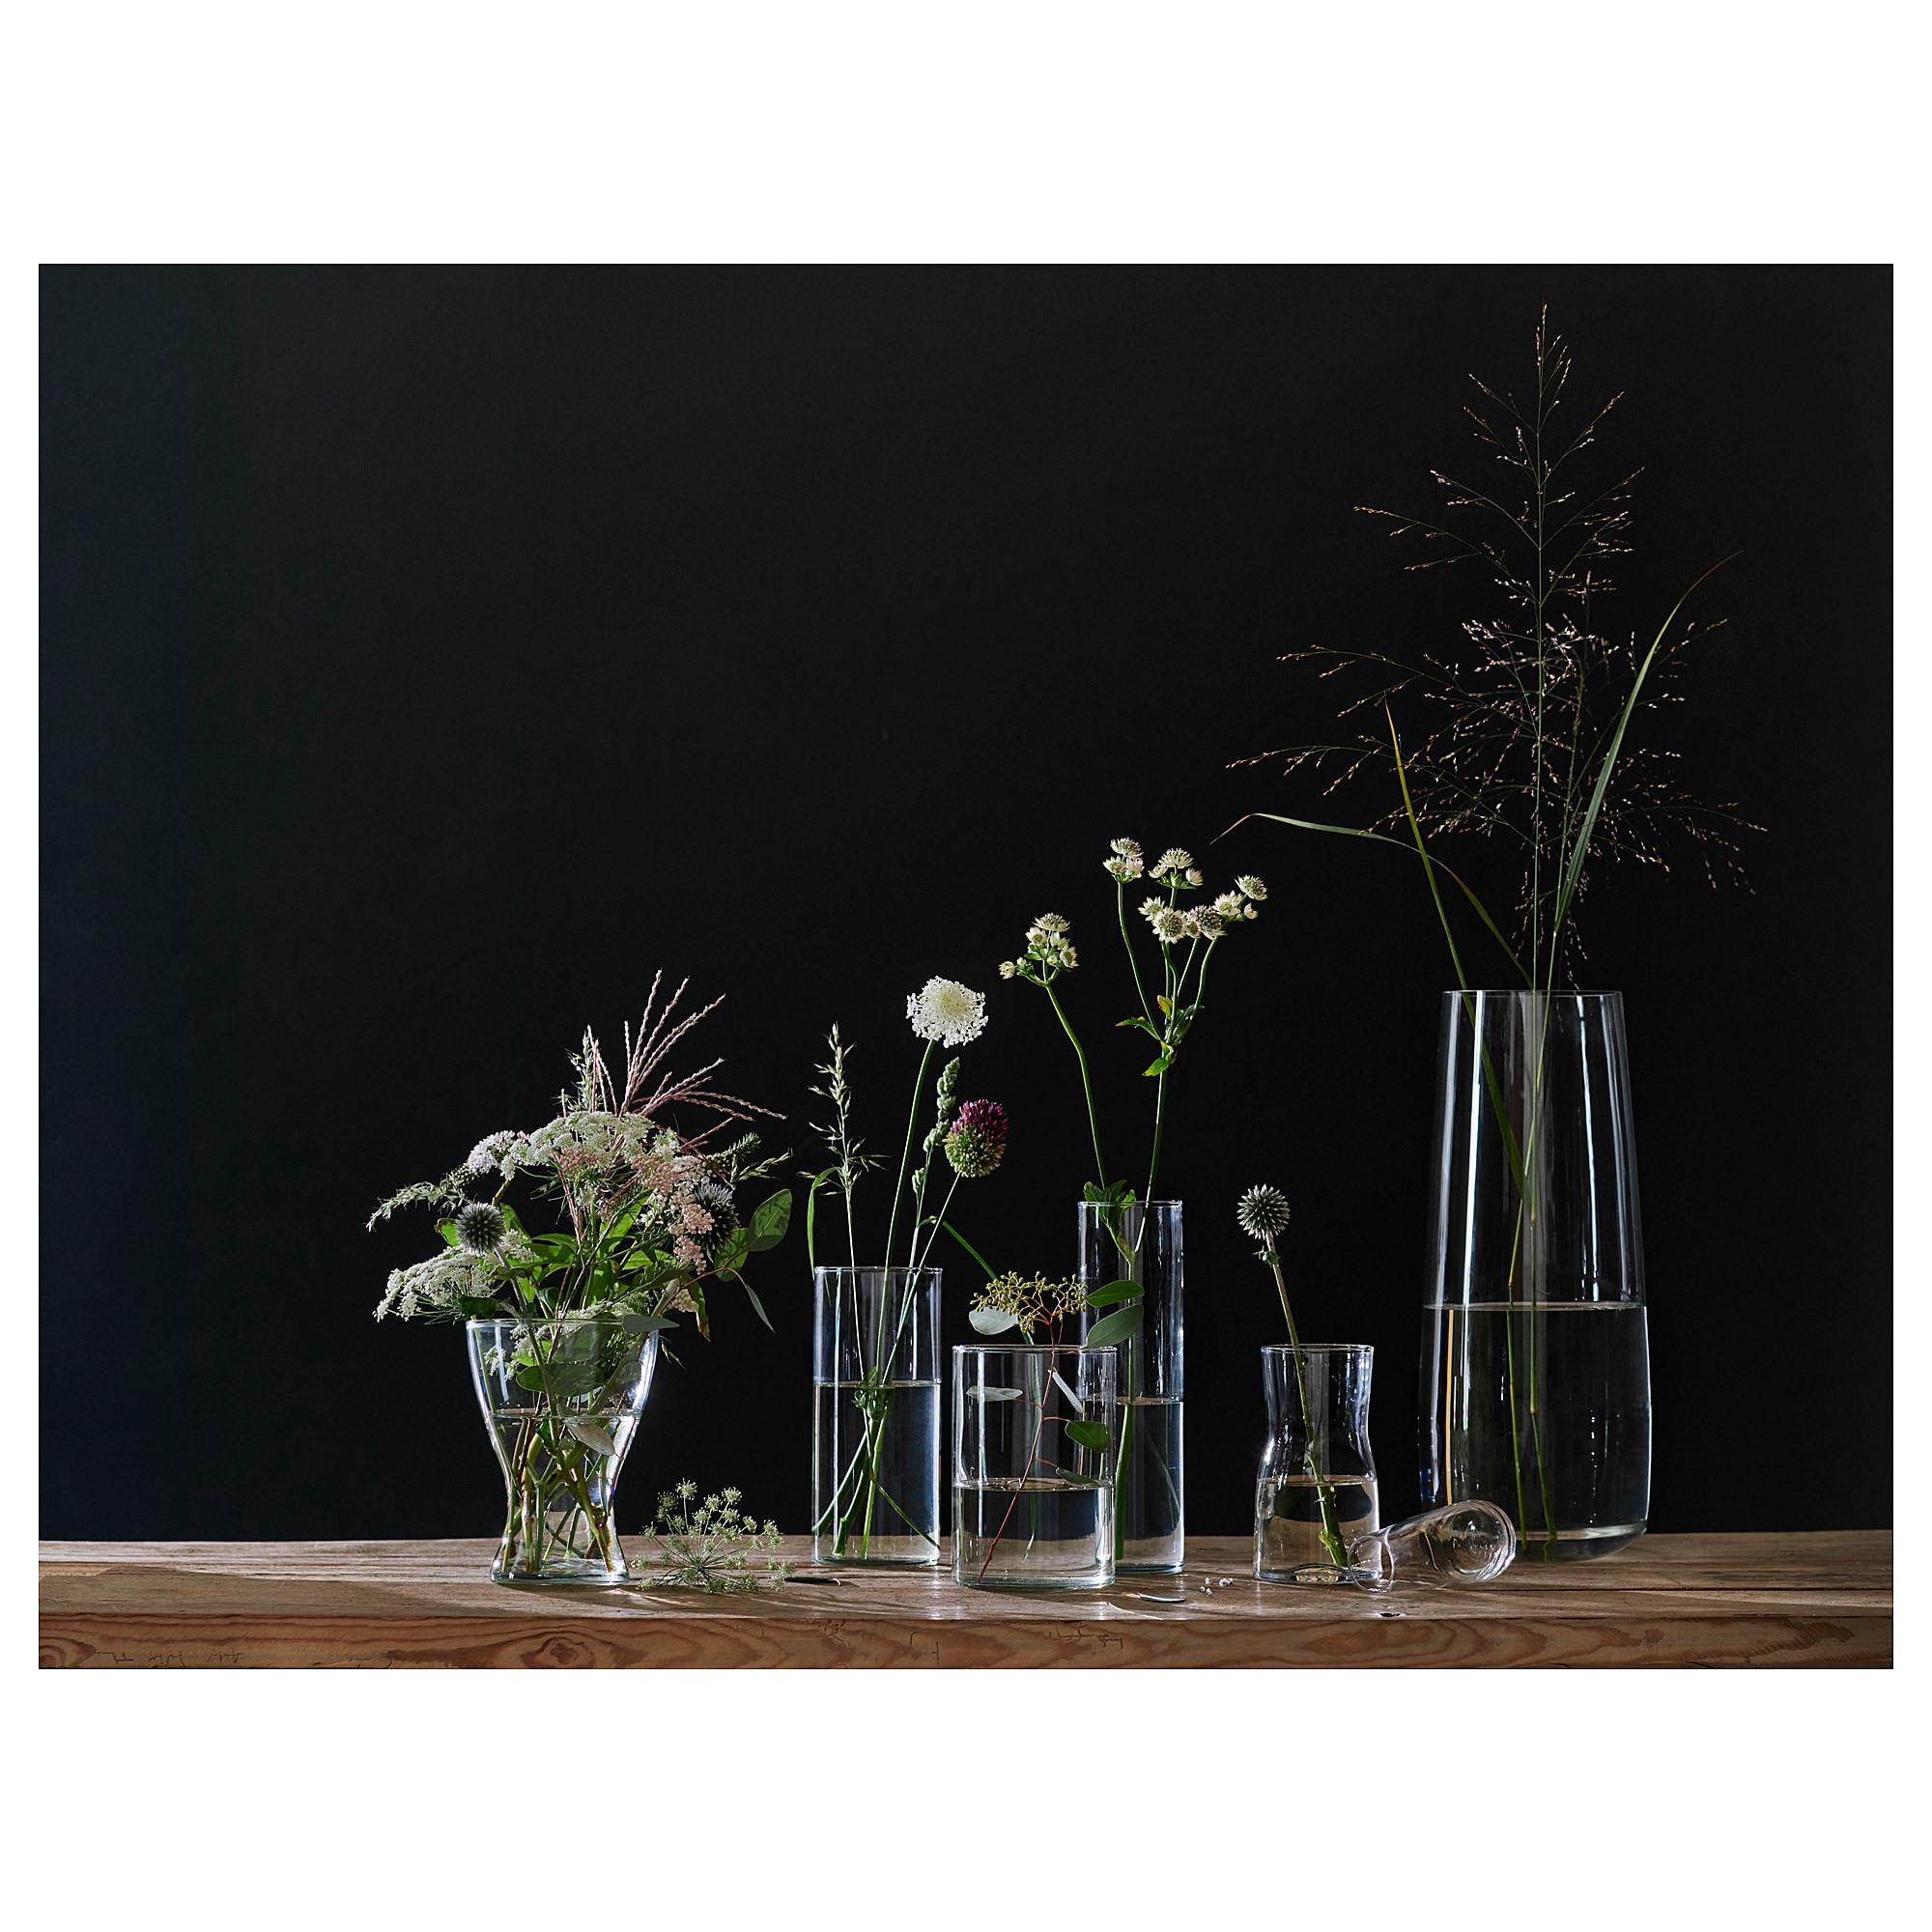 oversized recycled glass vases of cylinder vase set of 3 ikea regarding 0610772 ph149182 s5 jpg